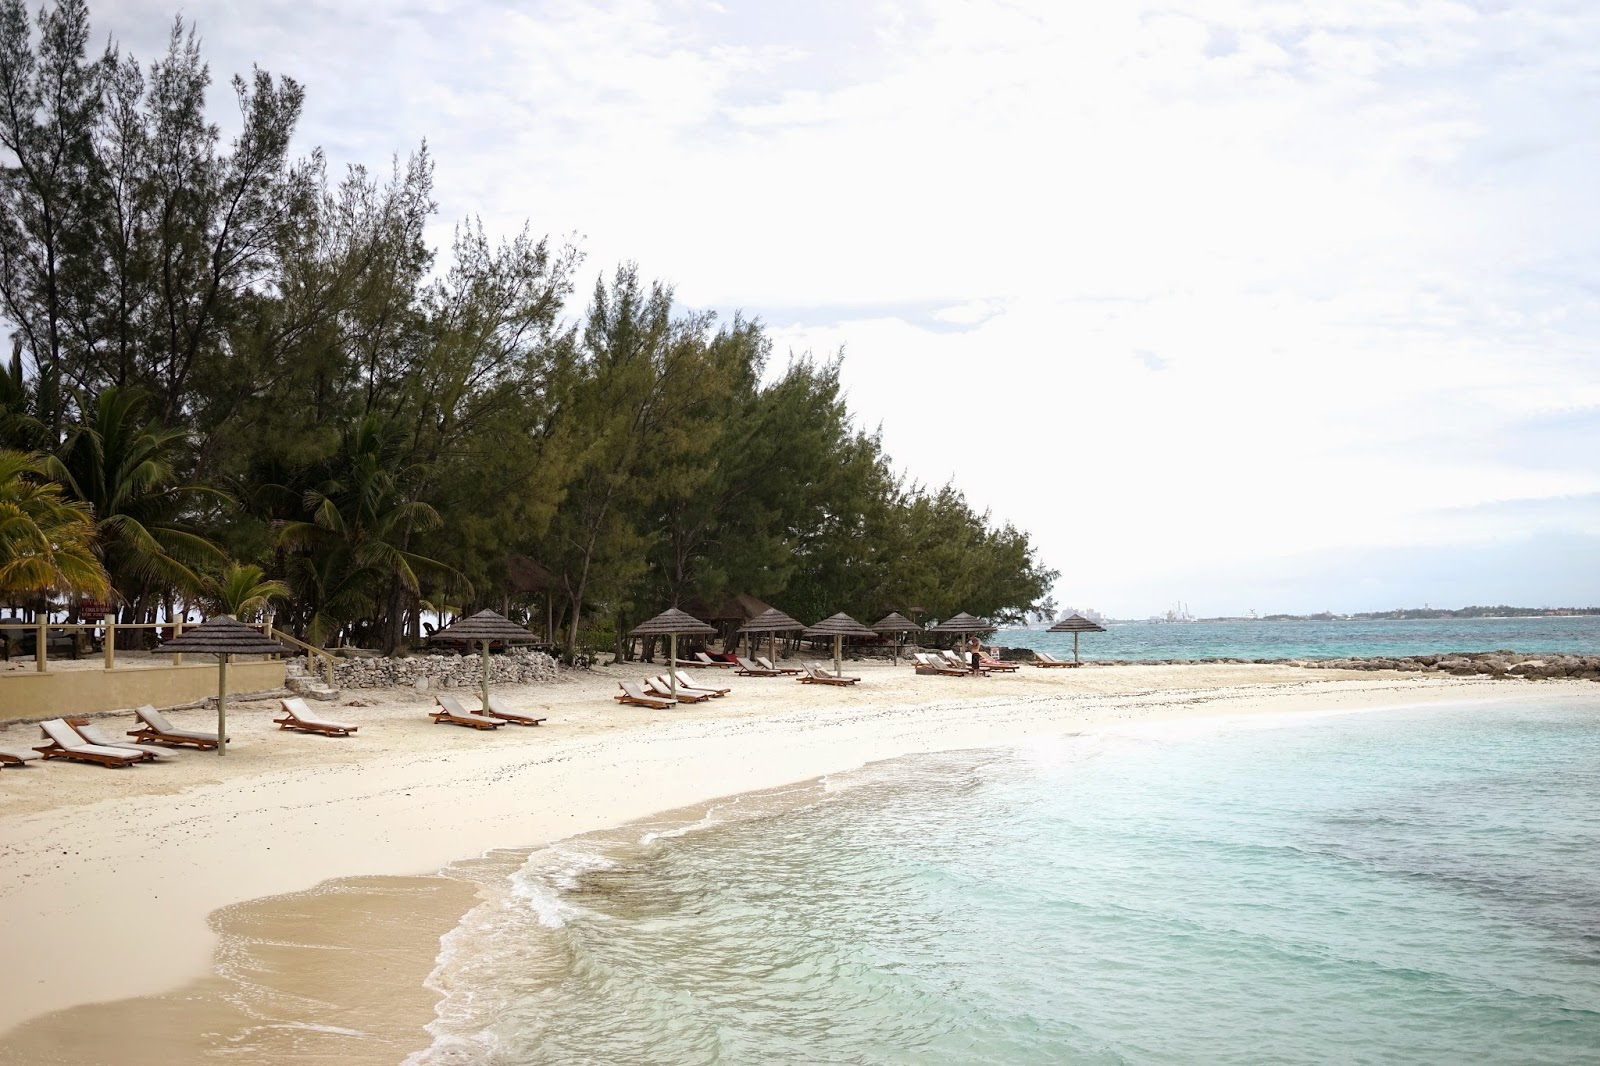 sandals cay bahamas